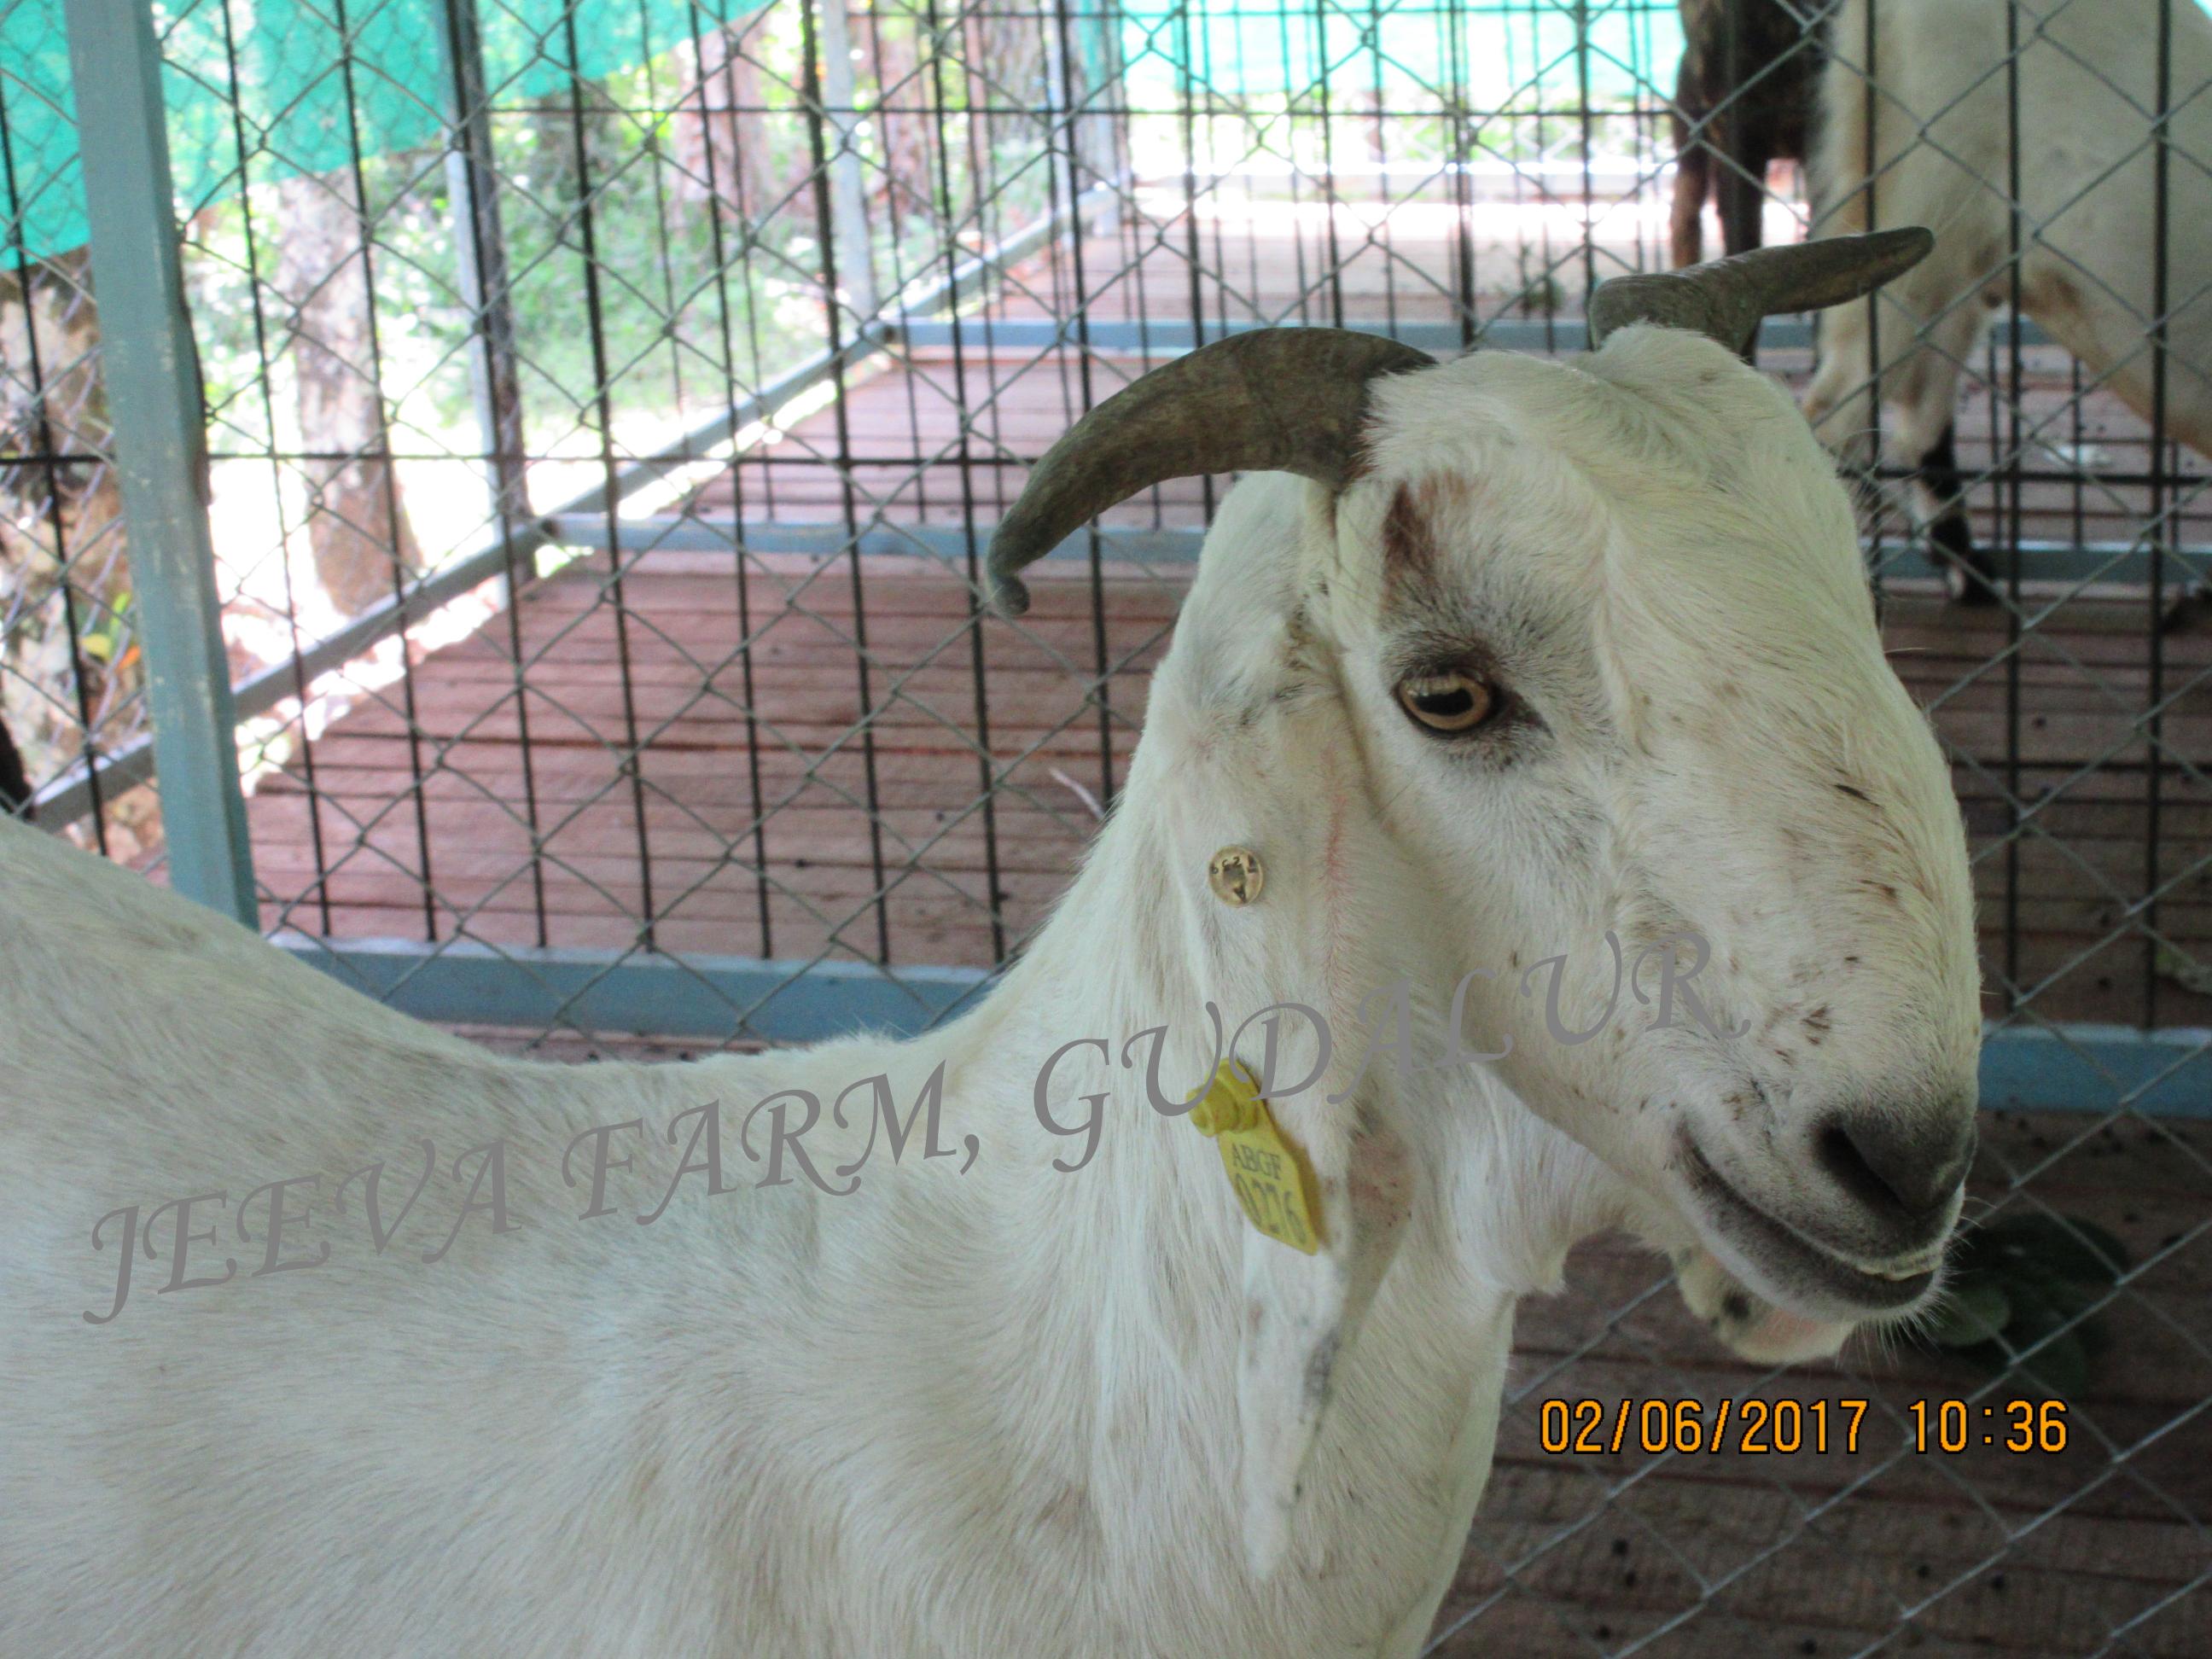 Goats – Jeeva Farm, Gudalur